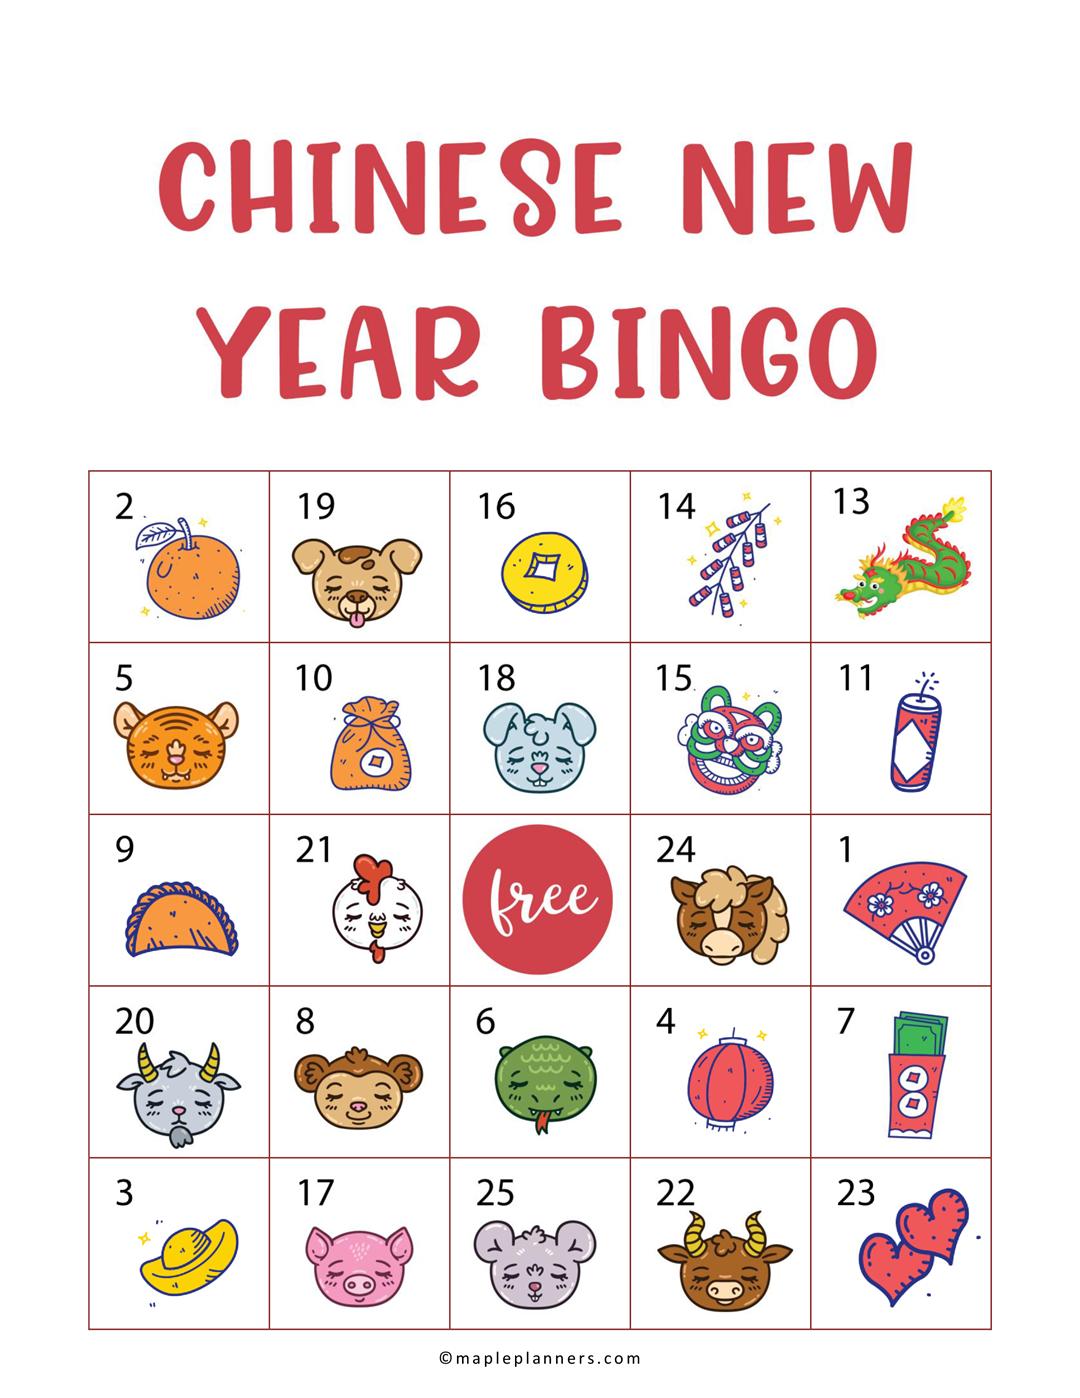 Free Printable Chinese New Years Eve Bingo Fun Activities For Kids In 2021 Bingo Cards Printable Chinese New Year Bingo